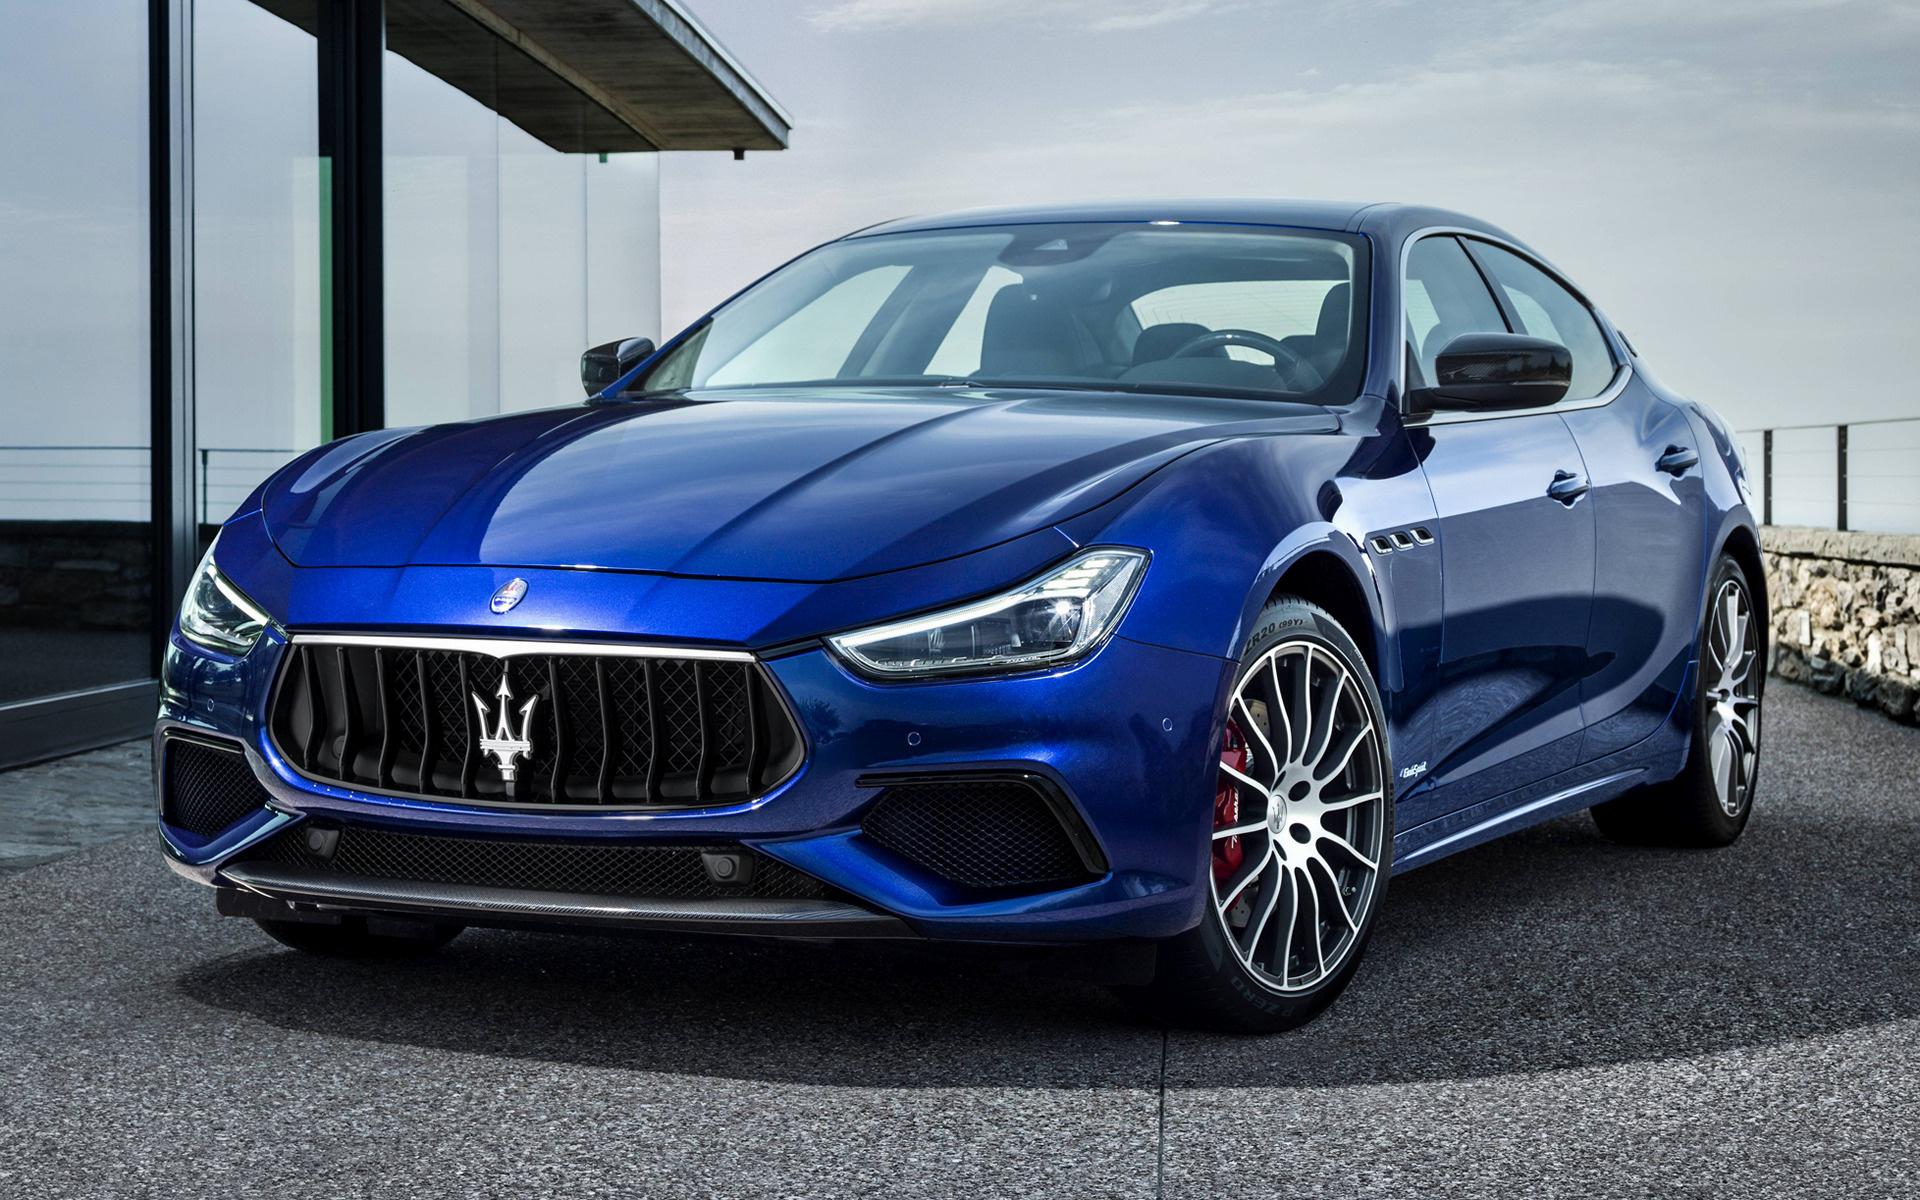 2017 Maserati Ghibli GranSport - Wallpapers and HD Images ...